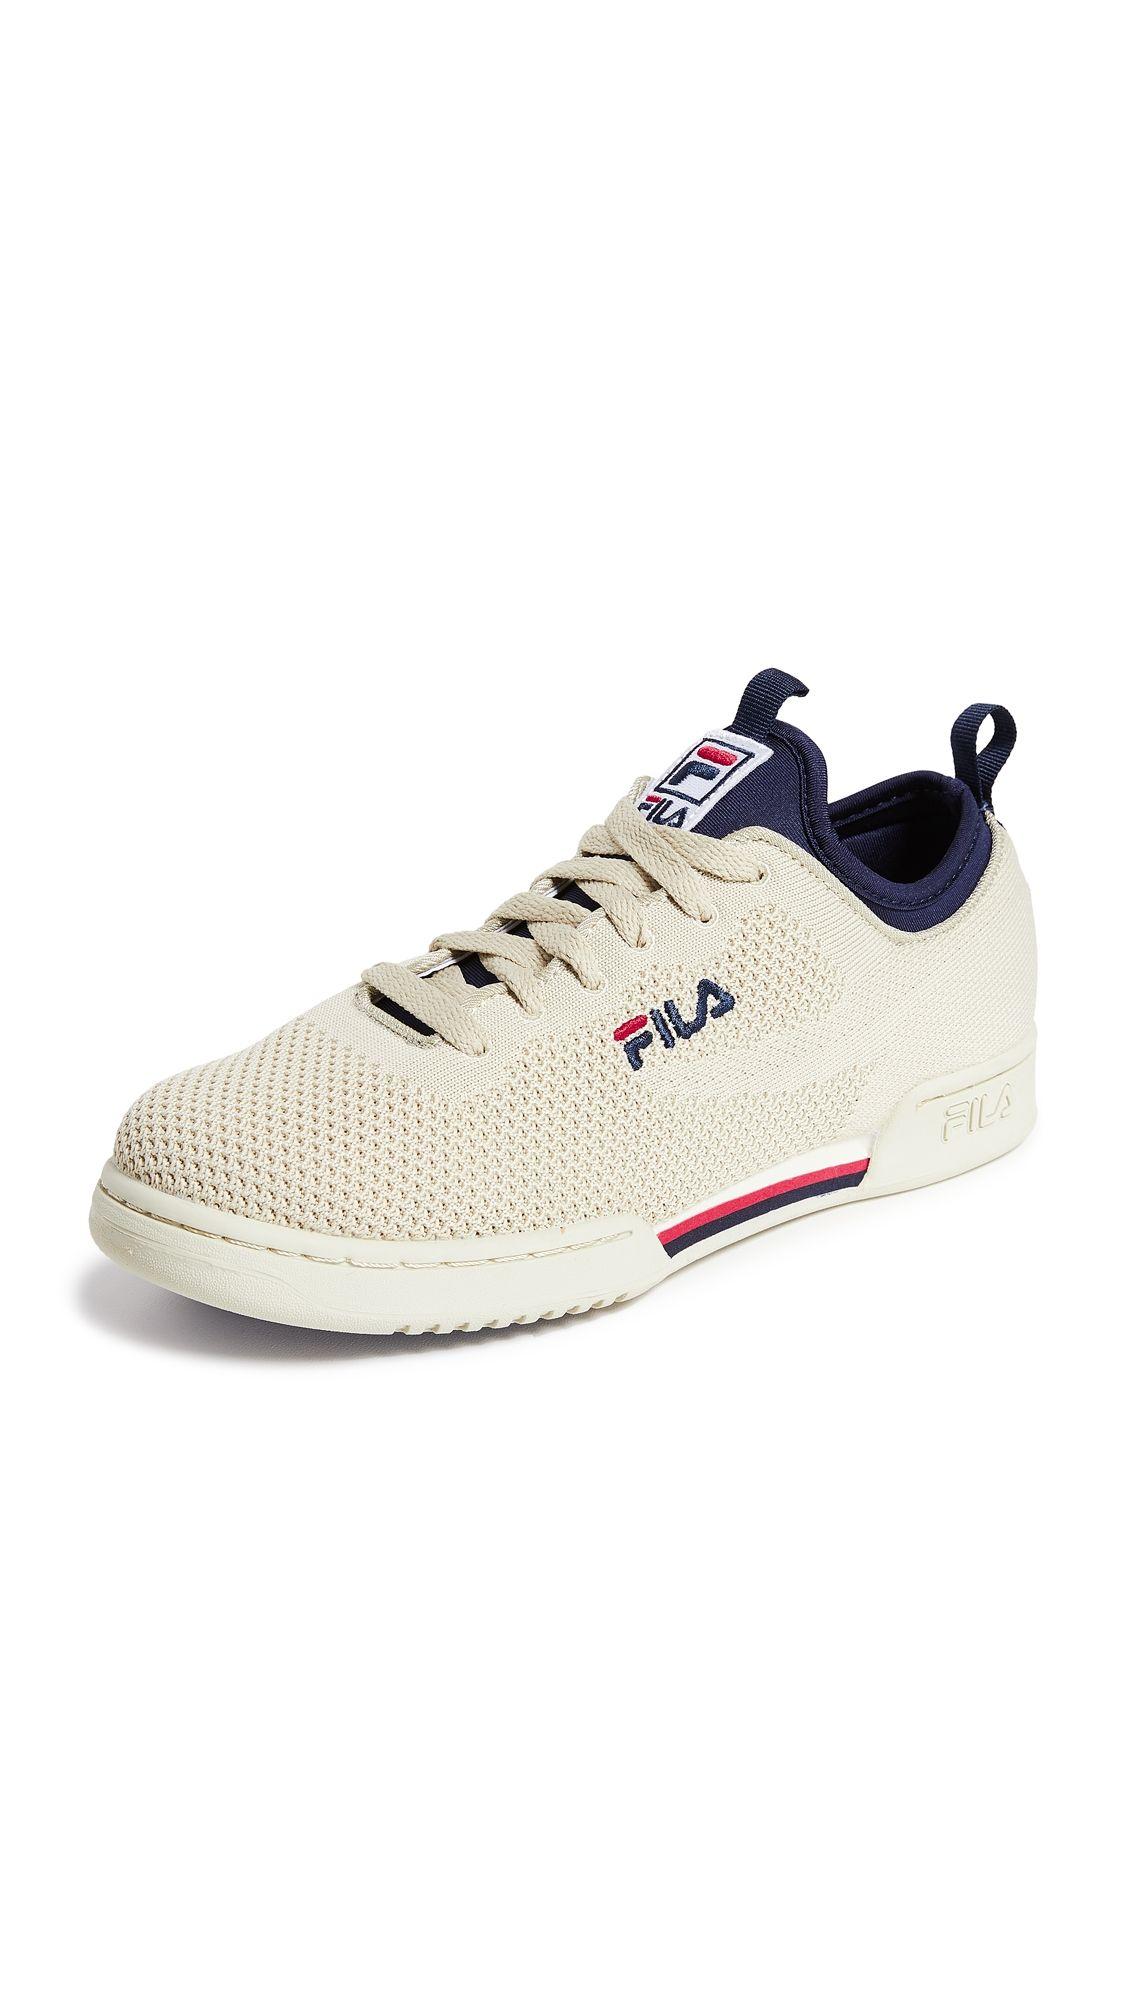 online store fe535 4efd2 FILA ORIGINAL FITNESS 2.0 SNEAKERS.  fila  shoes